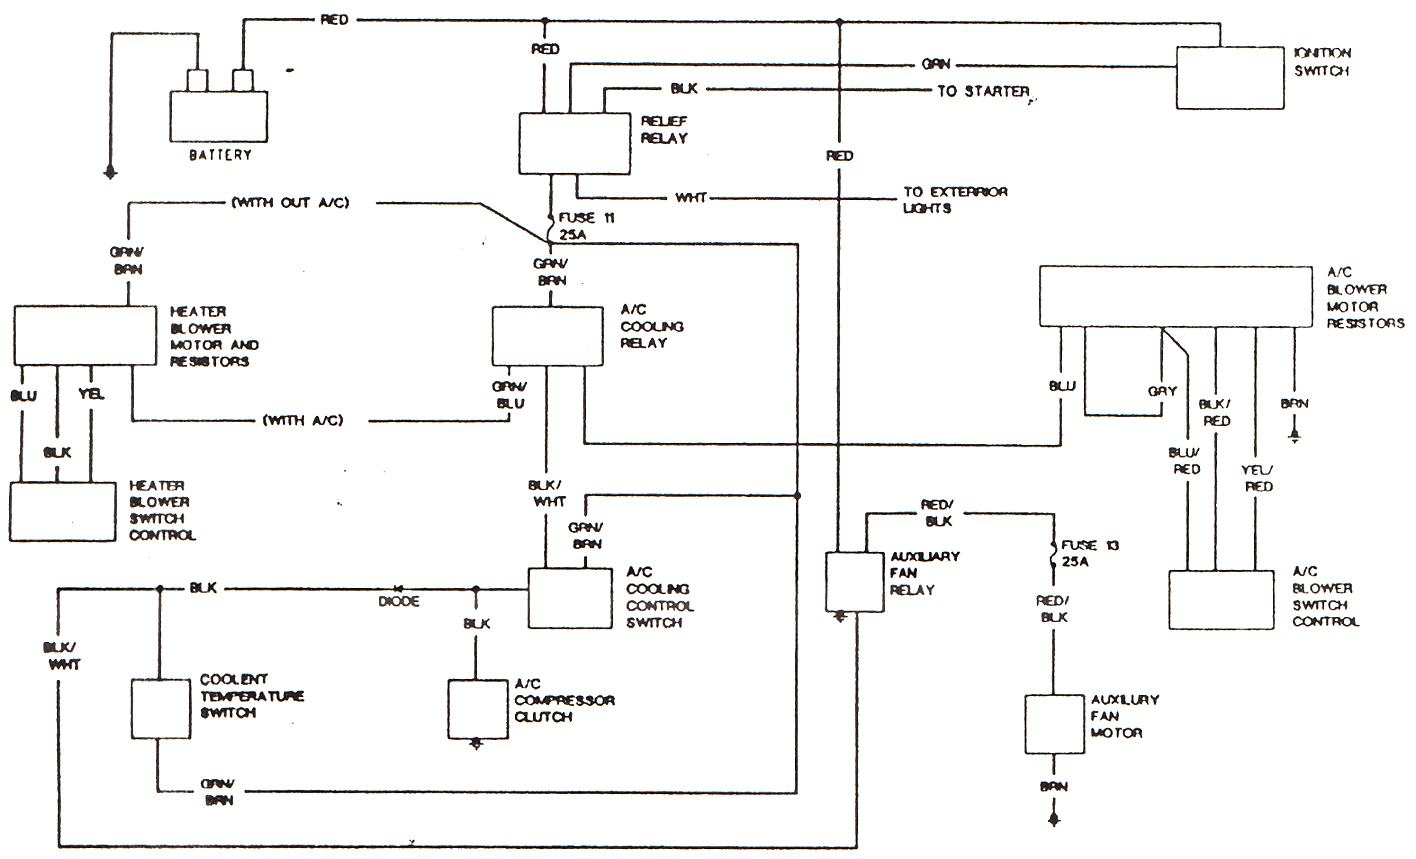 Free Auto Wiring Diagrams 120 240 Volt Motor Diagram Bmw 320i Ac